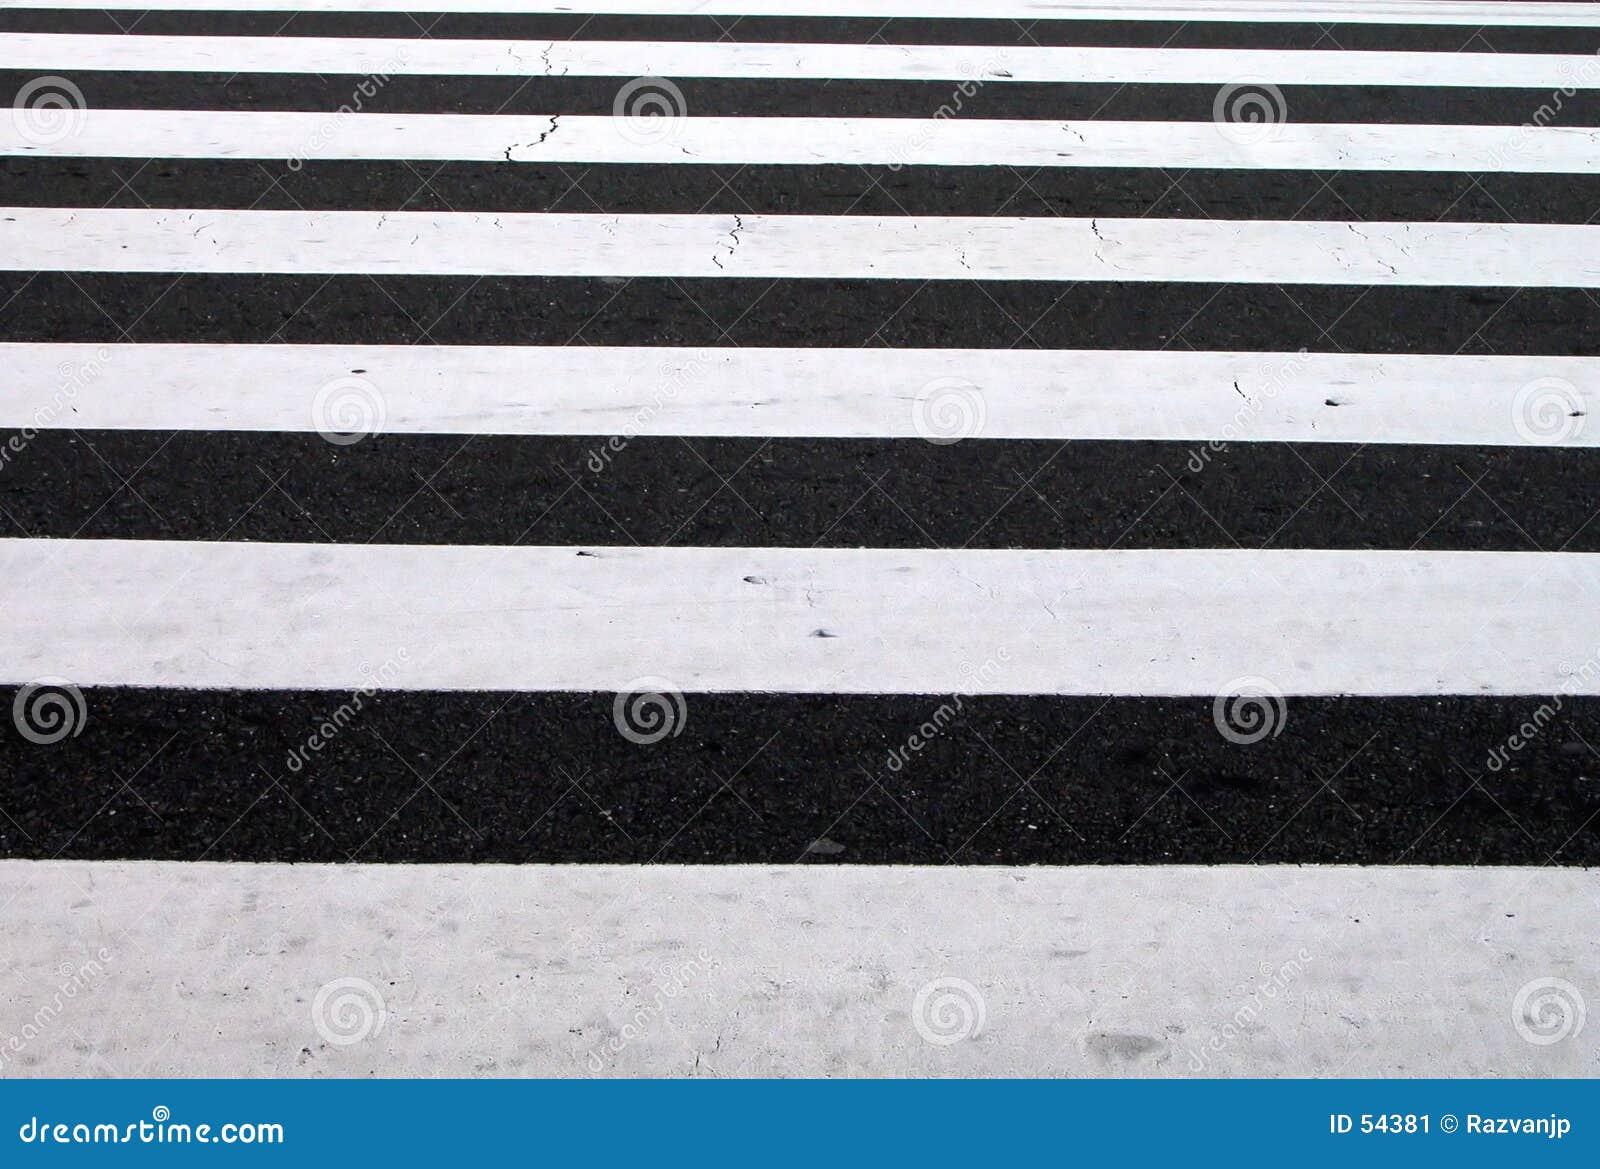 Textura peatonal del paso de peatones